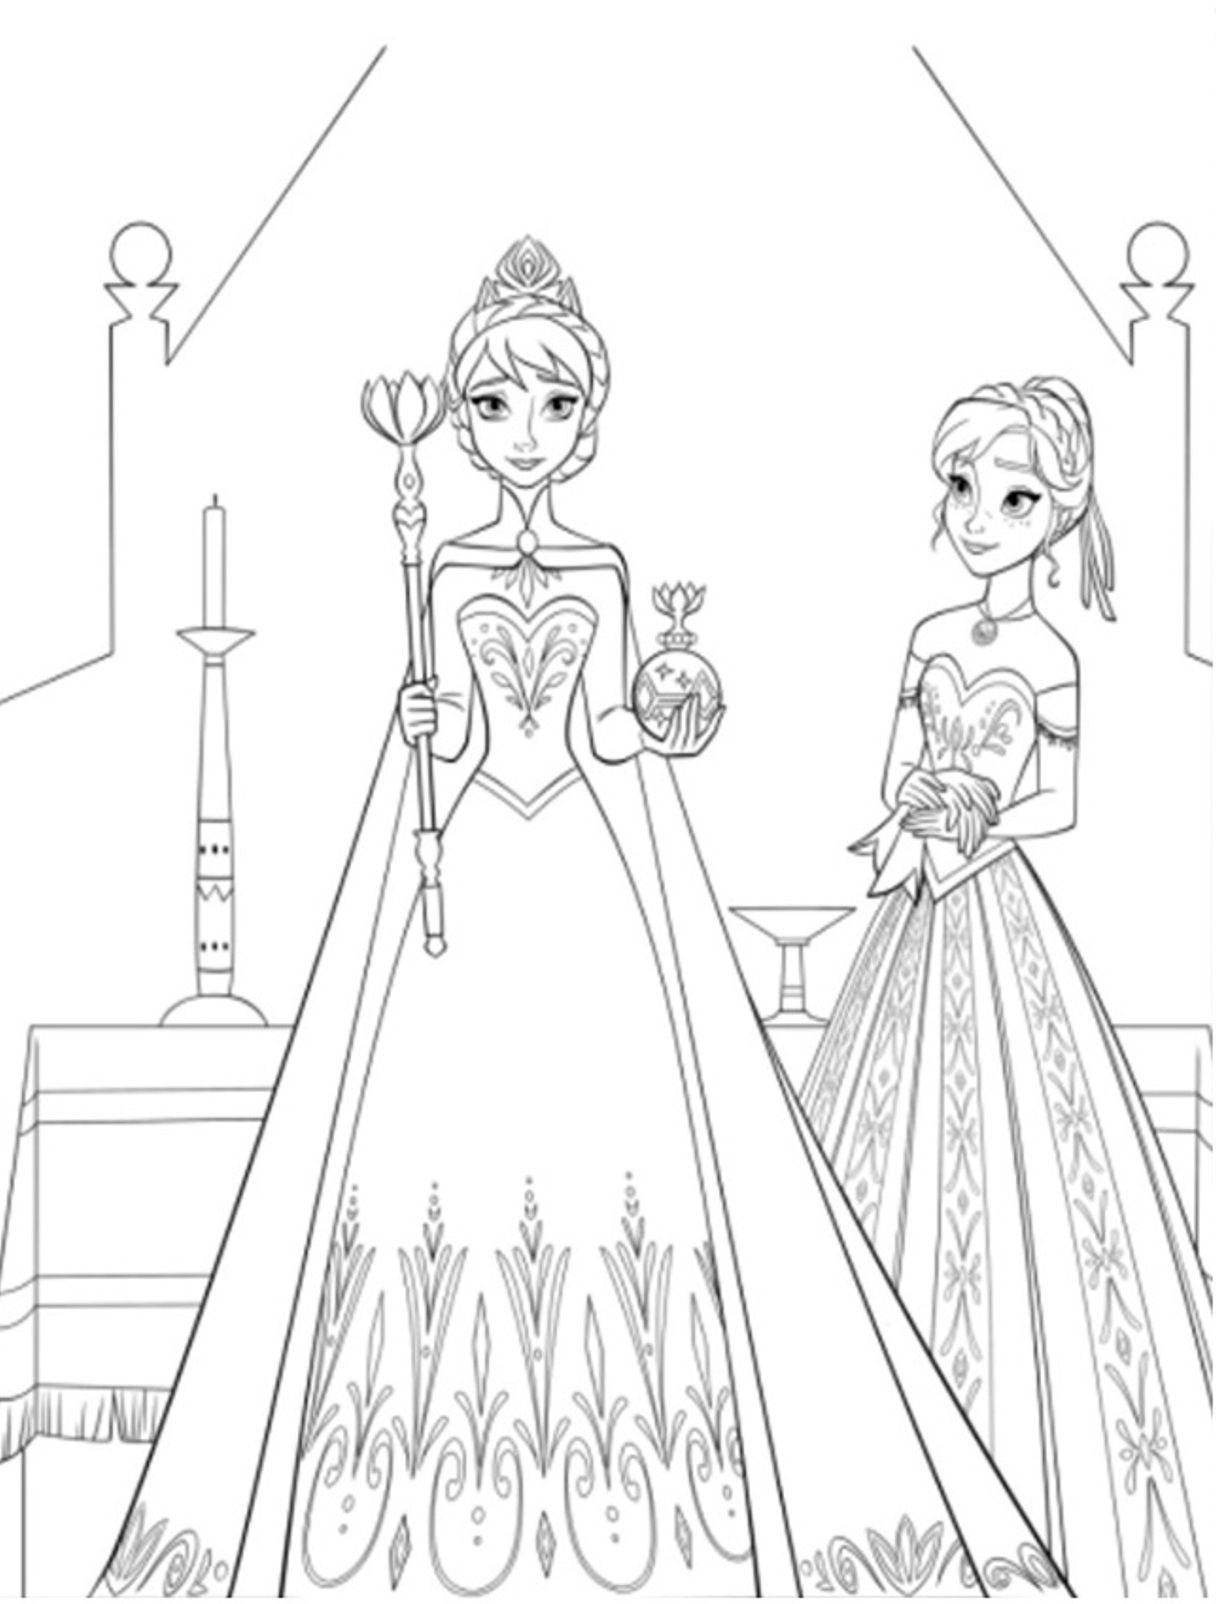 Frozen 2 coloring pages - Coloring Pages Frozen Coloring